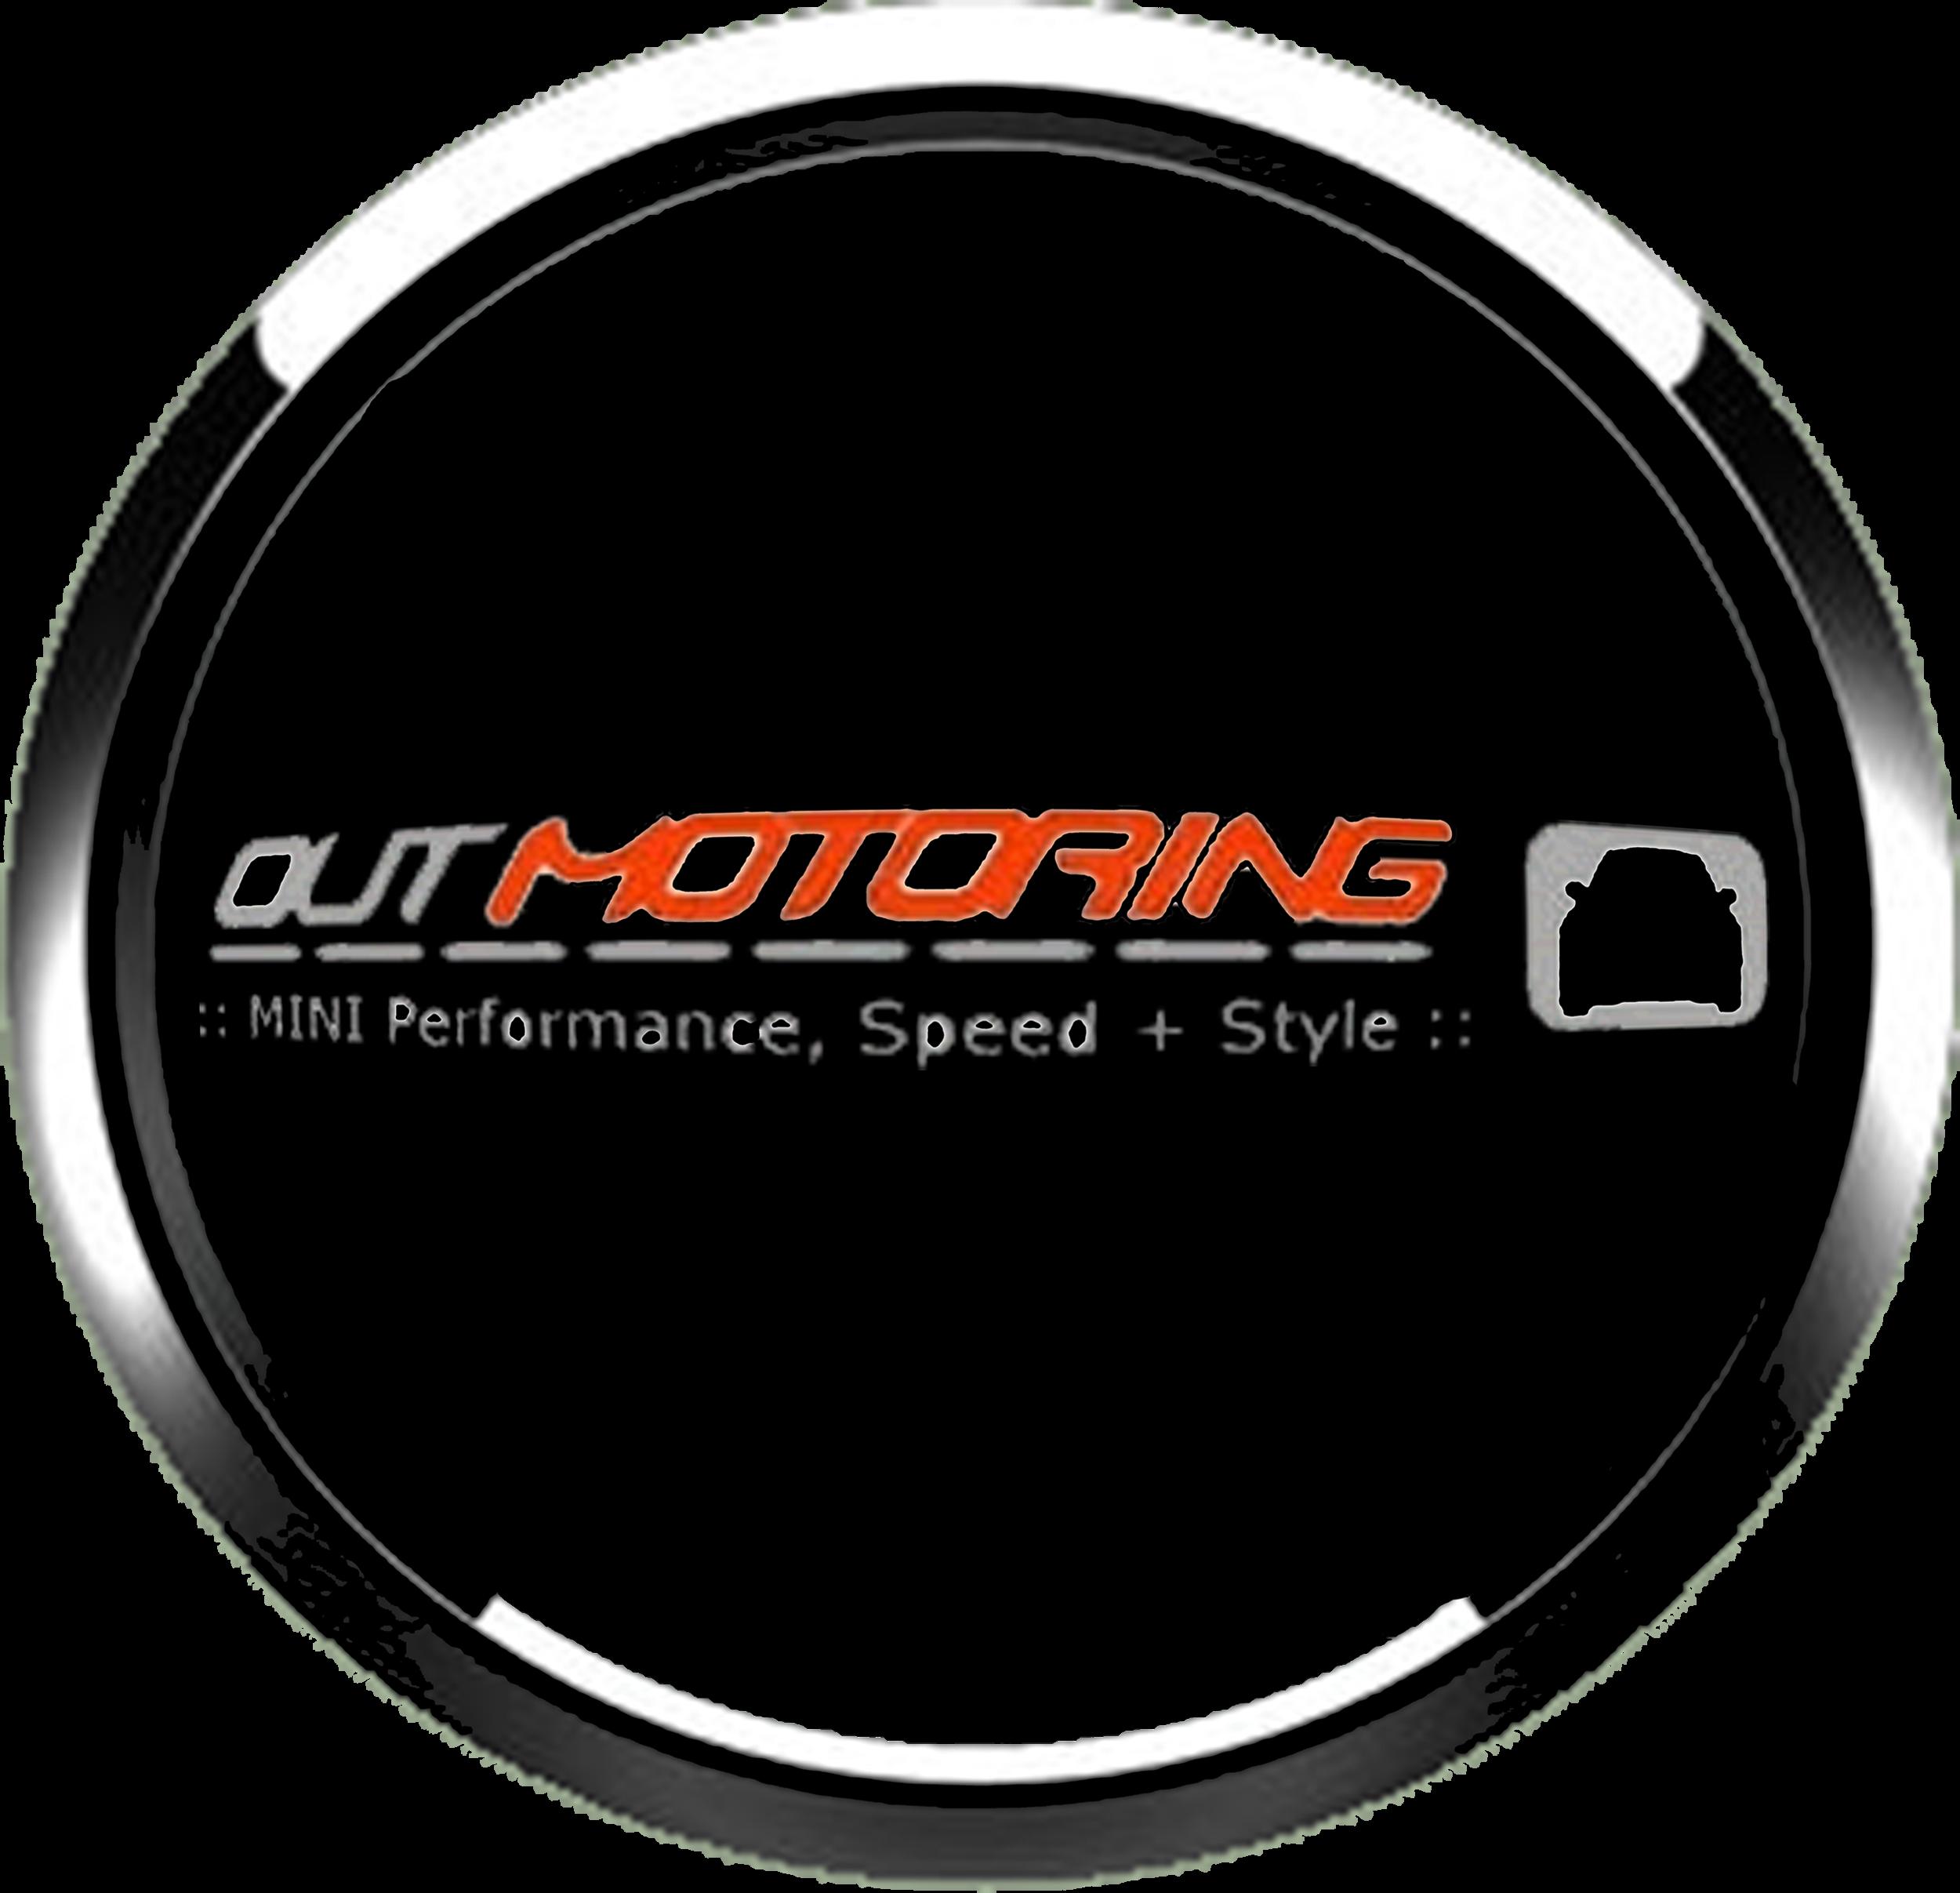 outmotoring badge.png